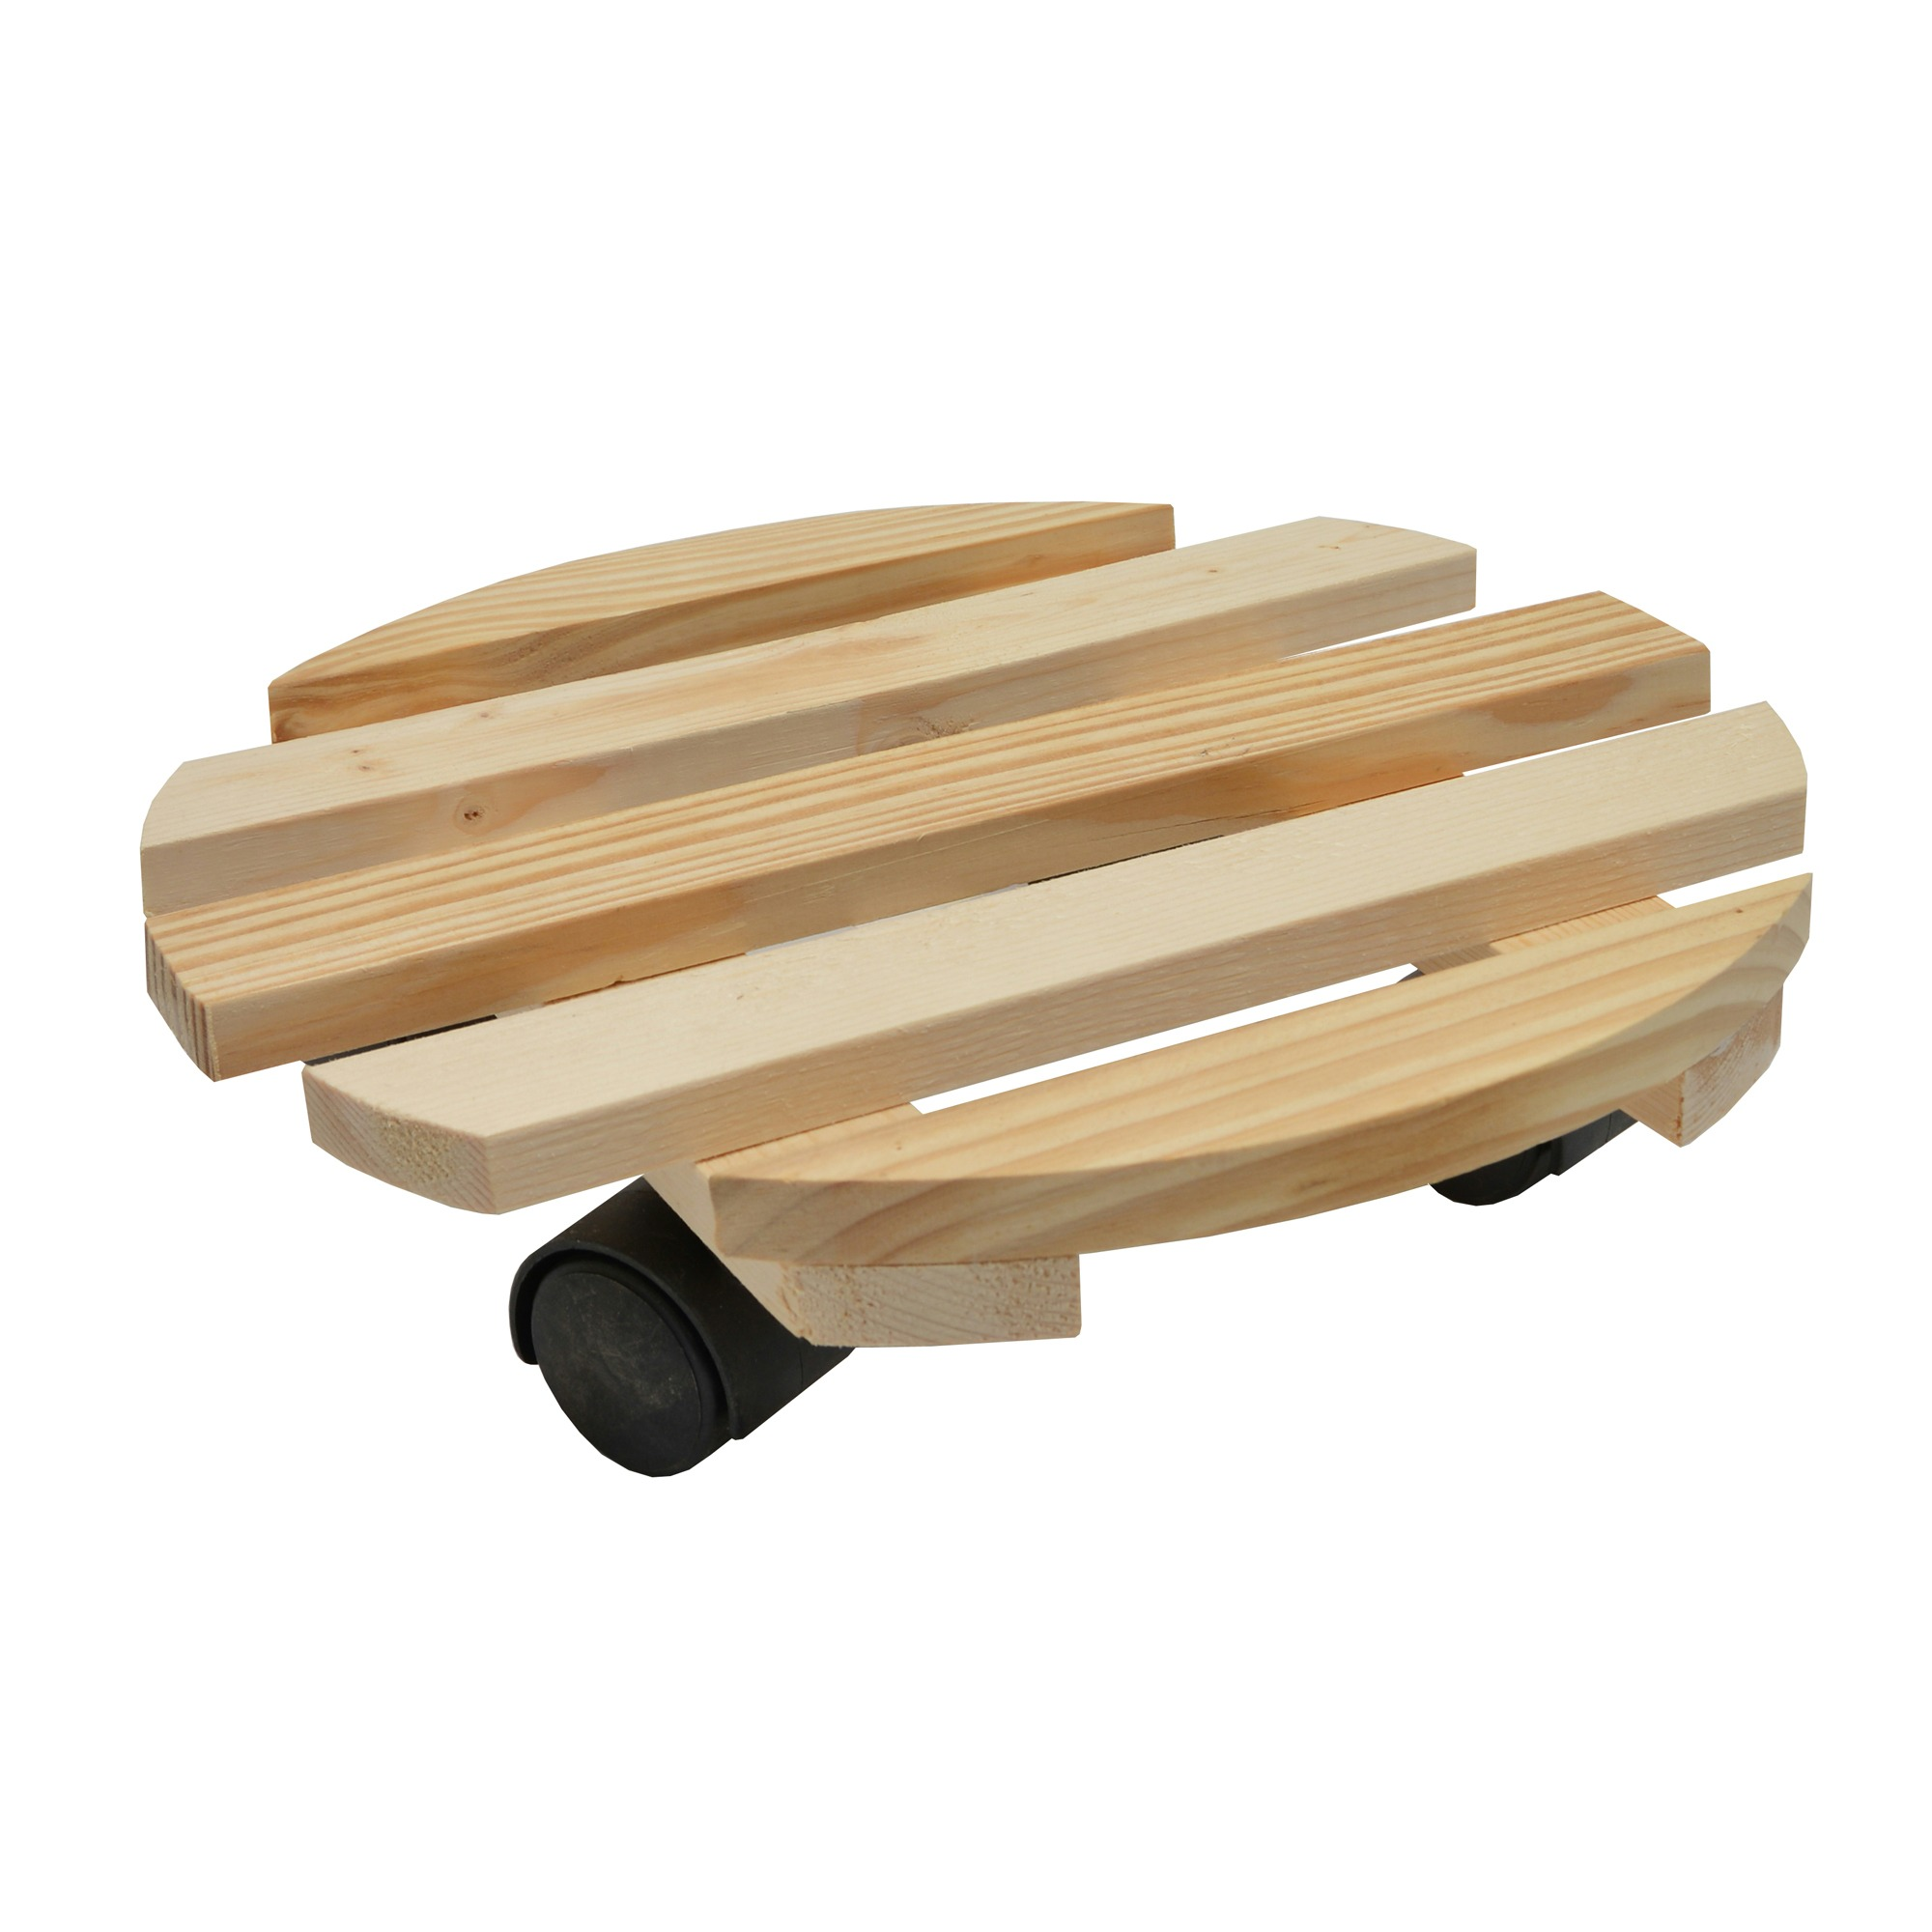 Wandplank Eiken Karwei.Grenen Planken Karwei Laminaat Grijs Bruin Mdf Lakken Hoogglans